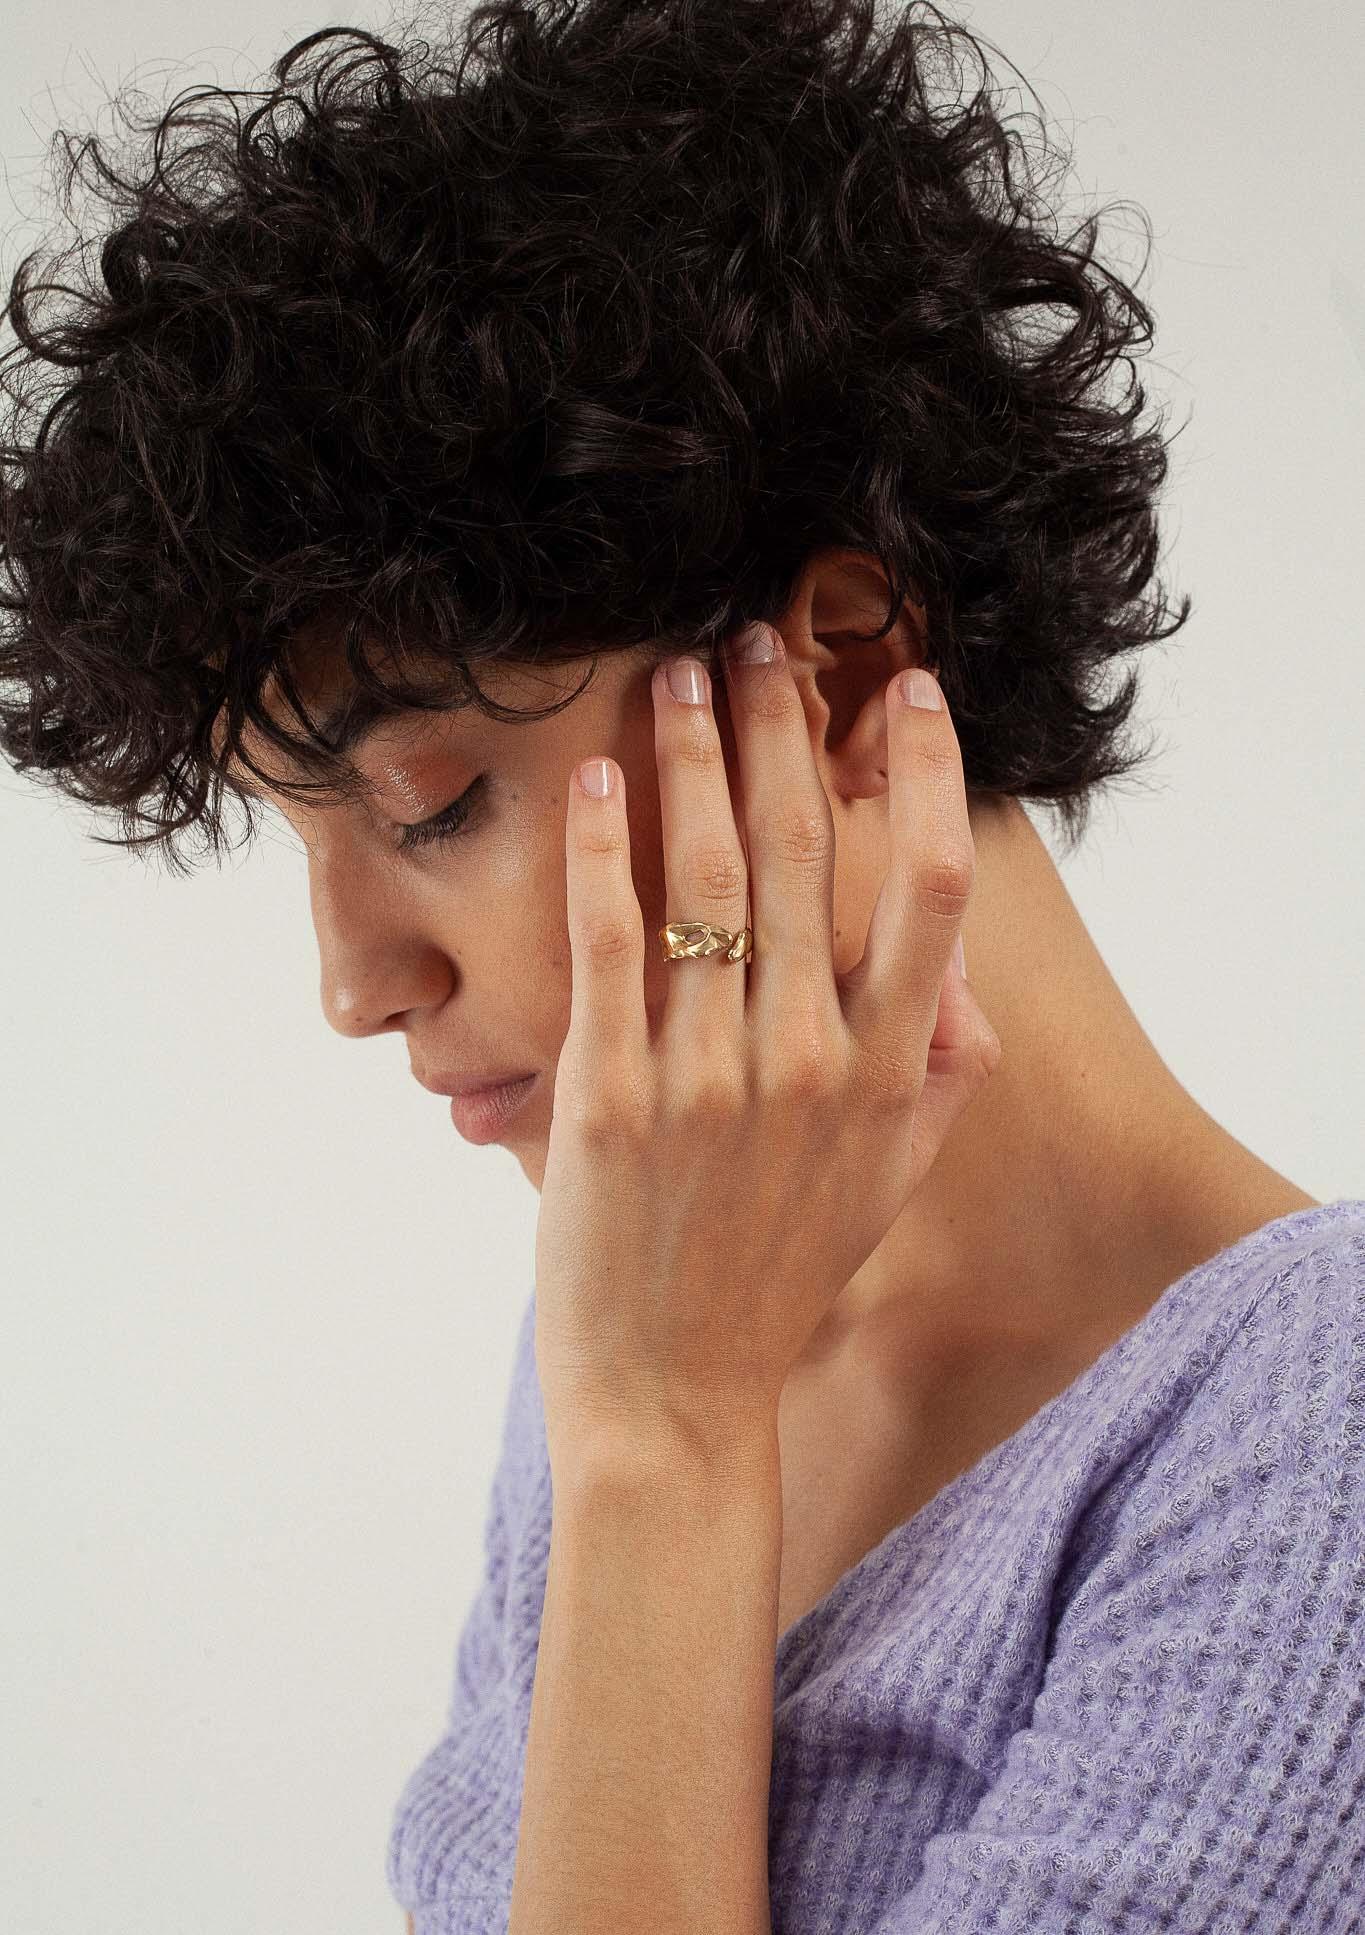 bague-anneau-reglable-ring-handmade-fait-main-new-basic-bresma-affaires-etrangeres